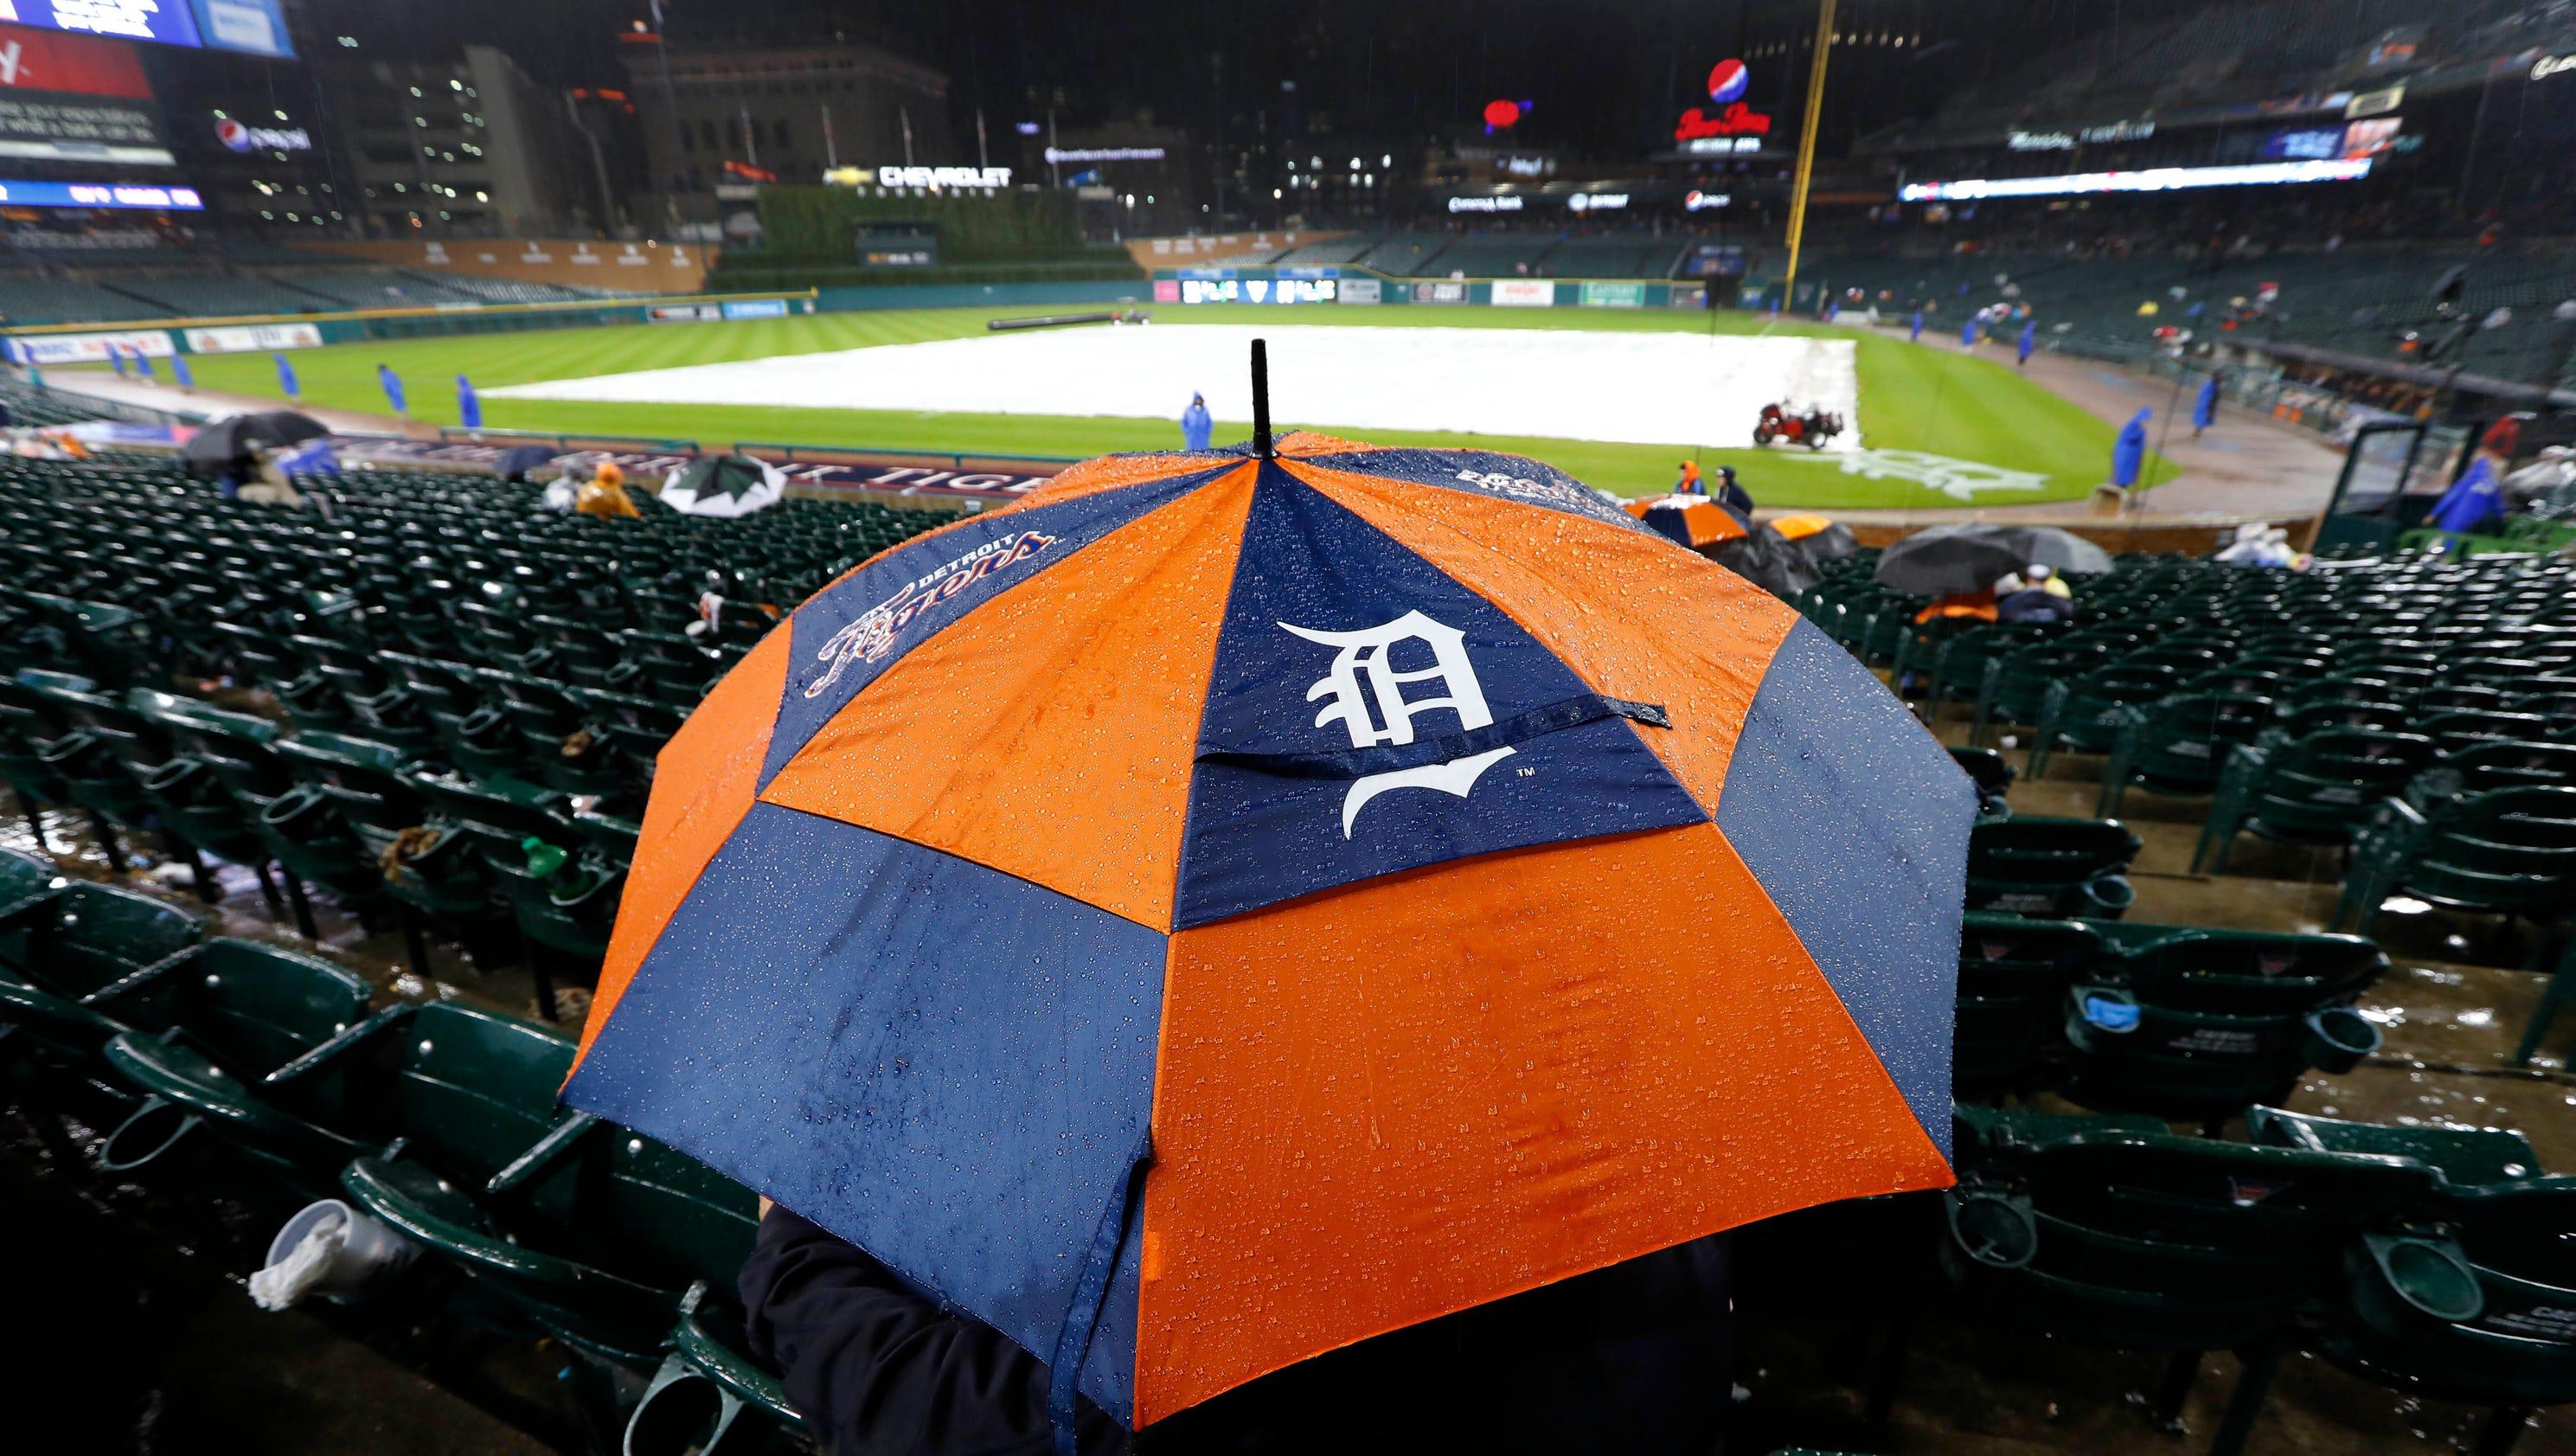 636135166865396985-ap-indians-tigers-baseball-m-1-